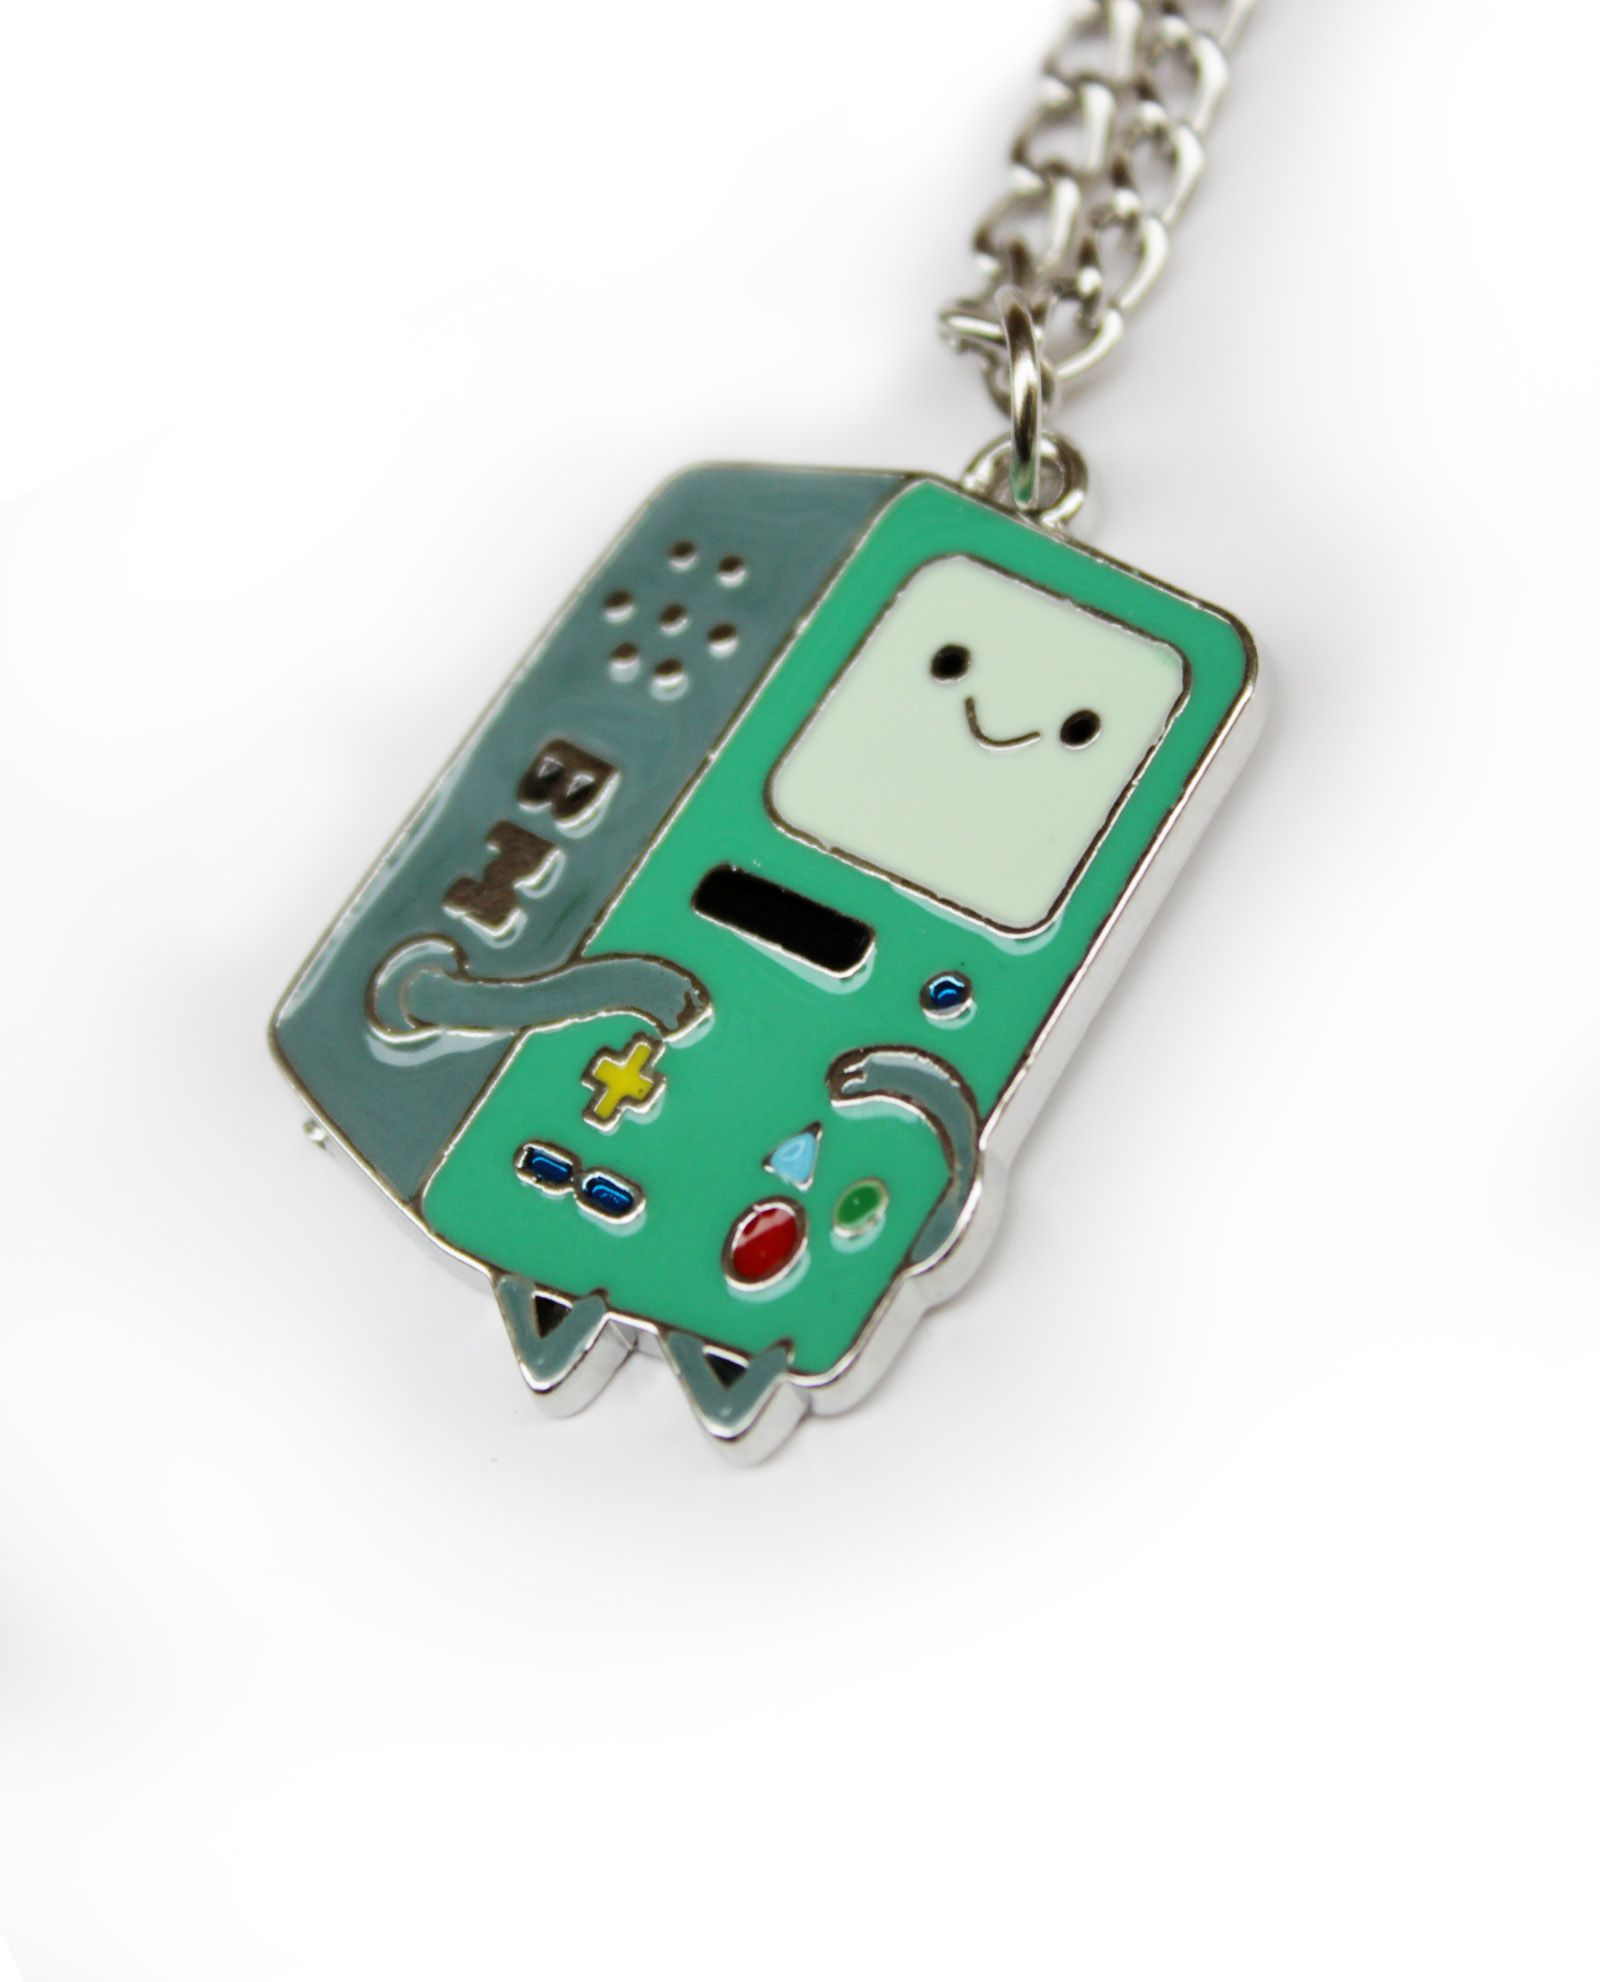 Collar BMO 12€    pikapikashop.com #timeofadventure #horadeaventuras #bmo #kawaii #cute #pikapikashop #barcelona